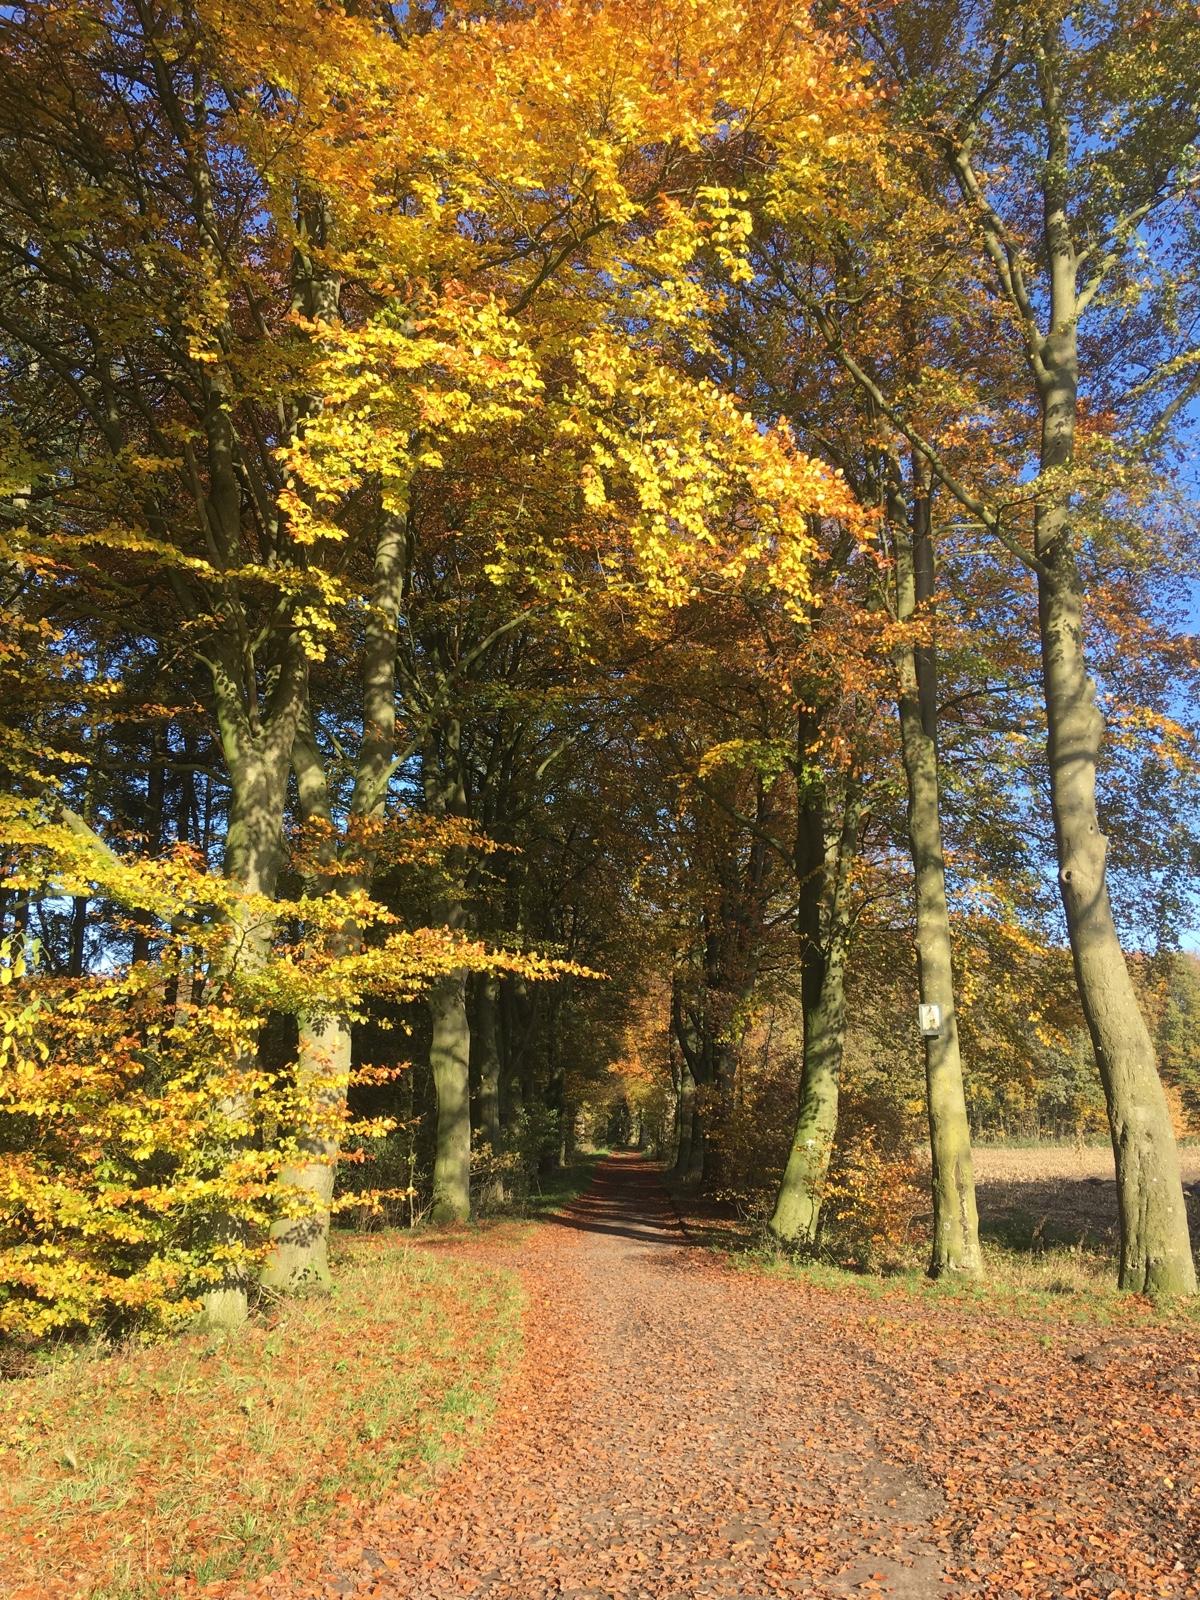 Herbst im Burgwald Dinklage am 10. November 2019